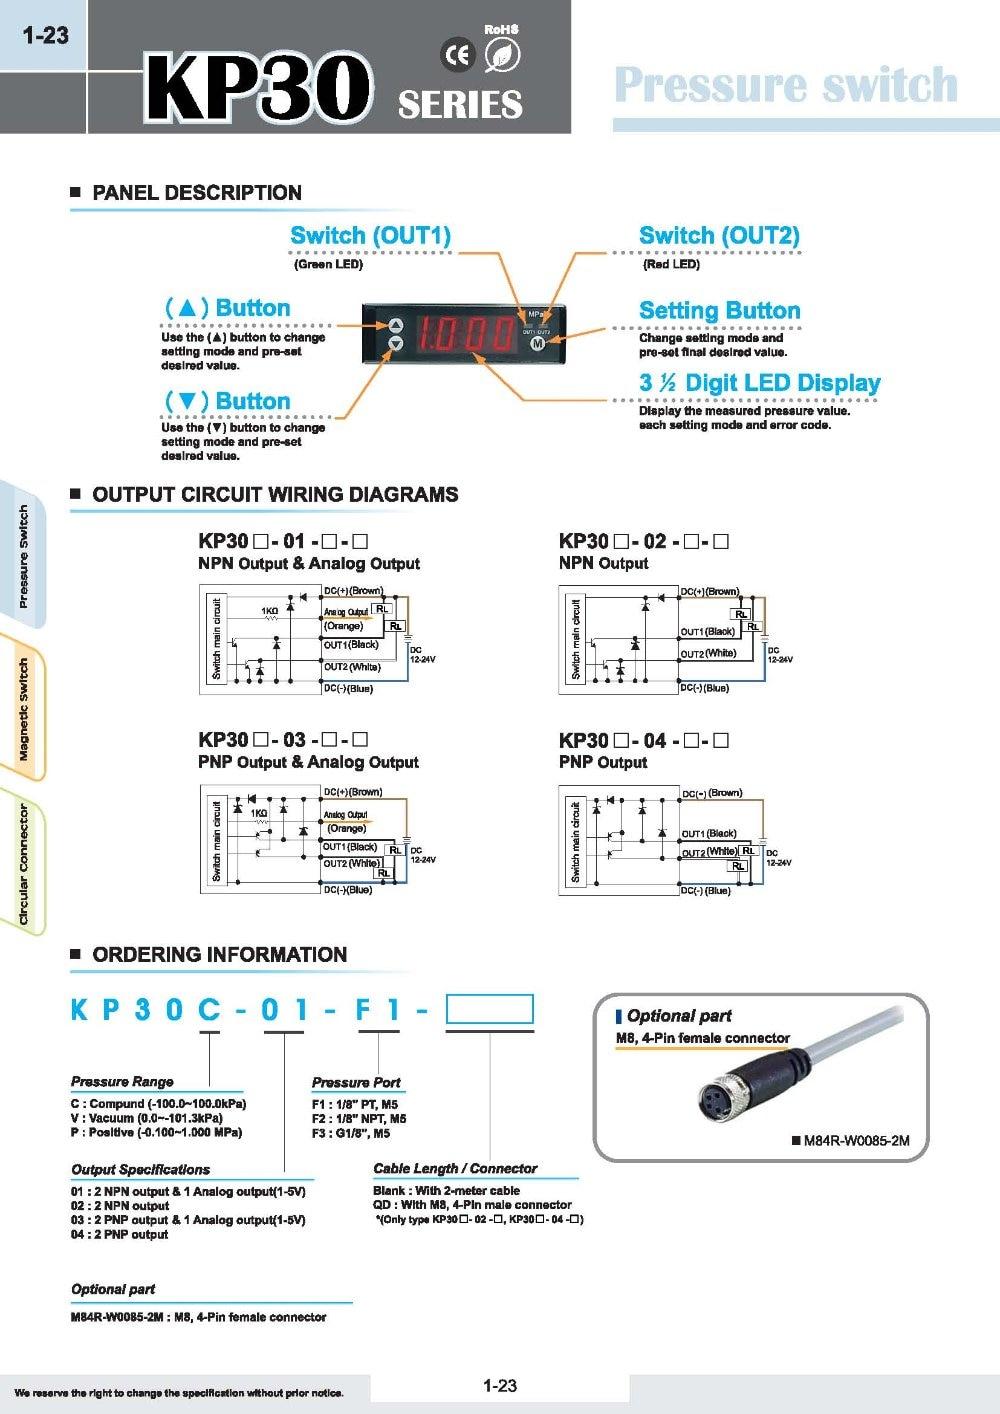 KITA digitale druckschalter KP30P 02 F1 0,1 ~ 1.0MPa DC12 24V 2 NPN AUSGANGSSTUFE in KITA digitale druckschalter KP30P-02-F1-0,1 ~ 1.0MPa DC12-24V 2 ...